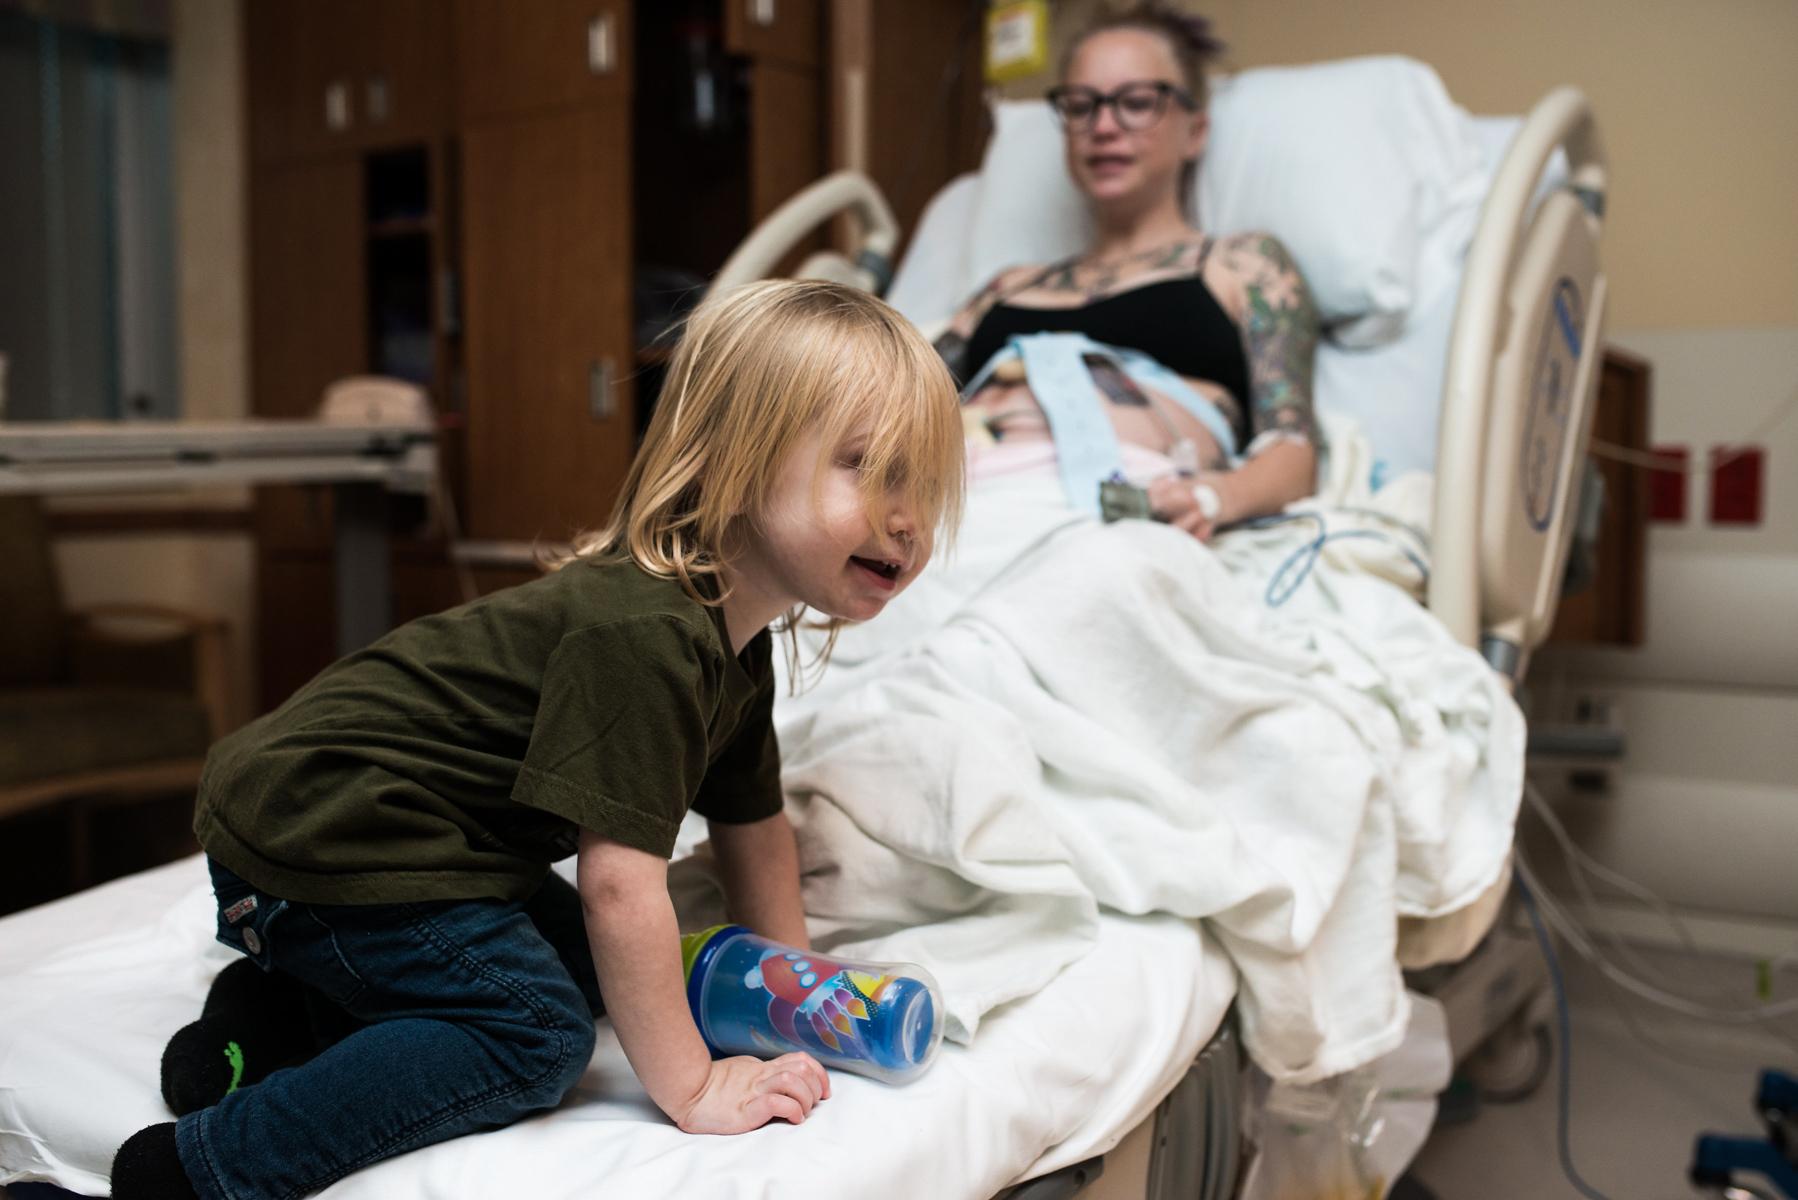 denver-birth-photographer-older-sibling-plays